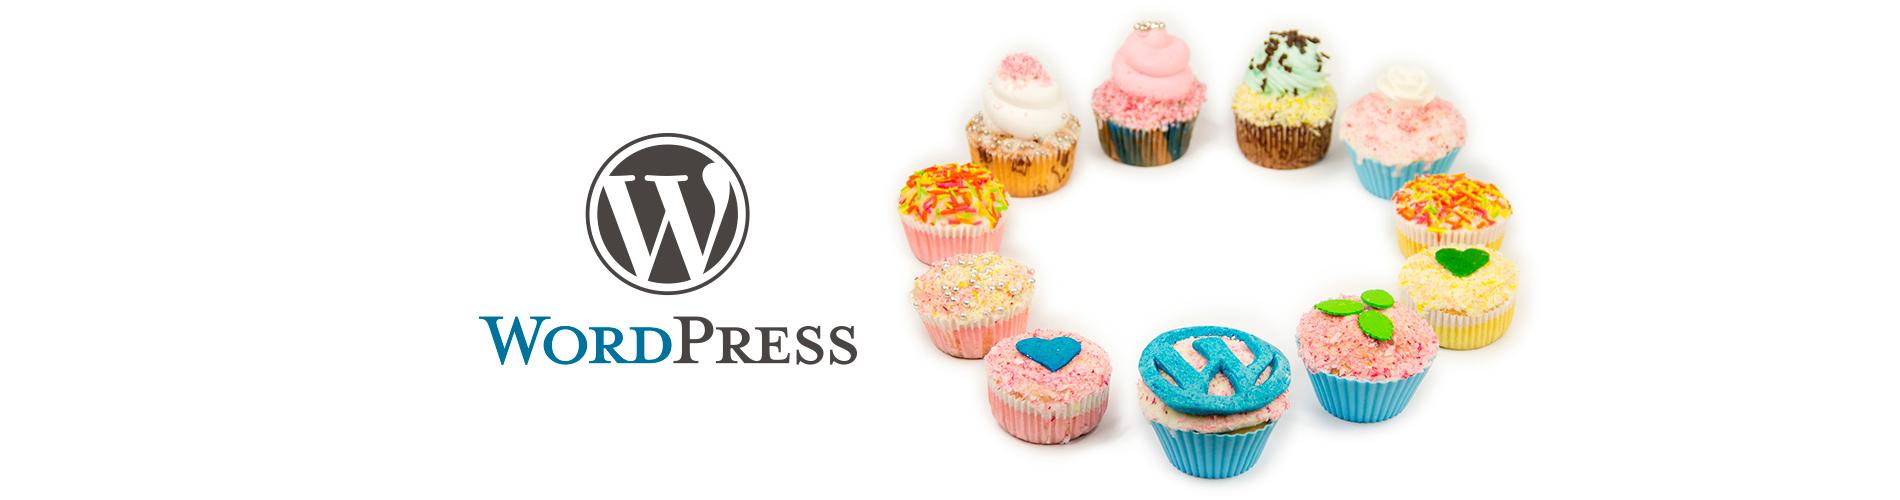 WordPressサイト制作セミナー開催中!